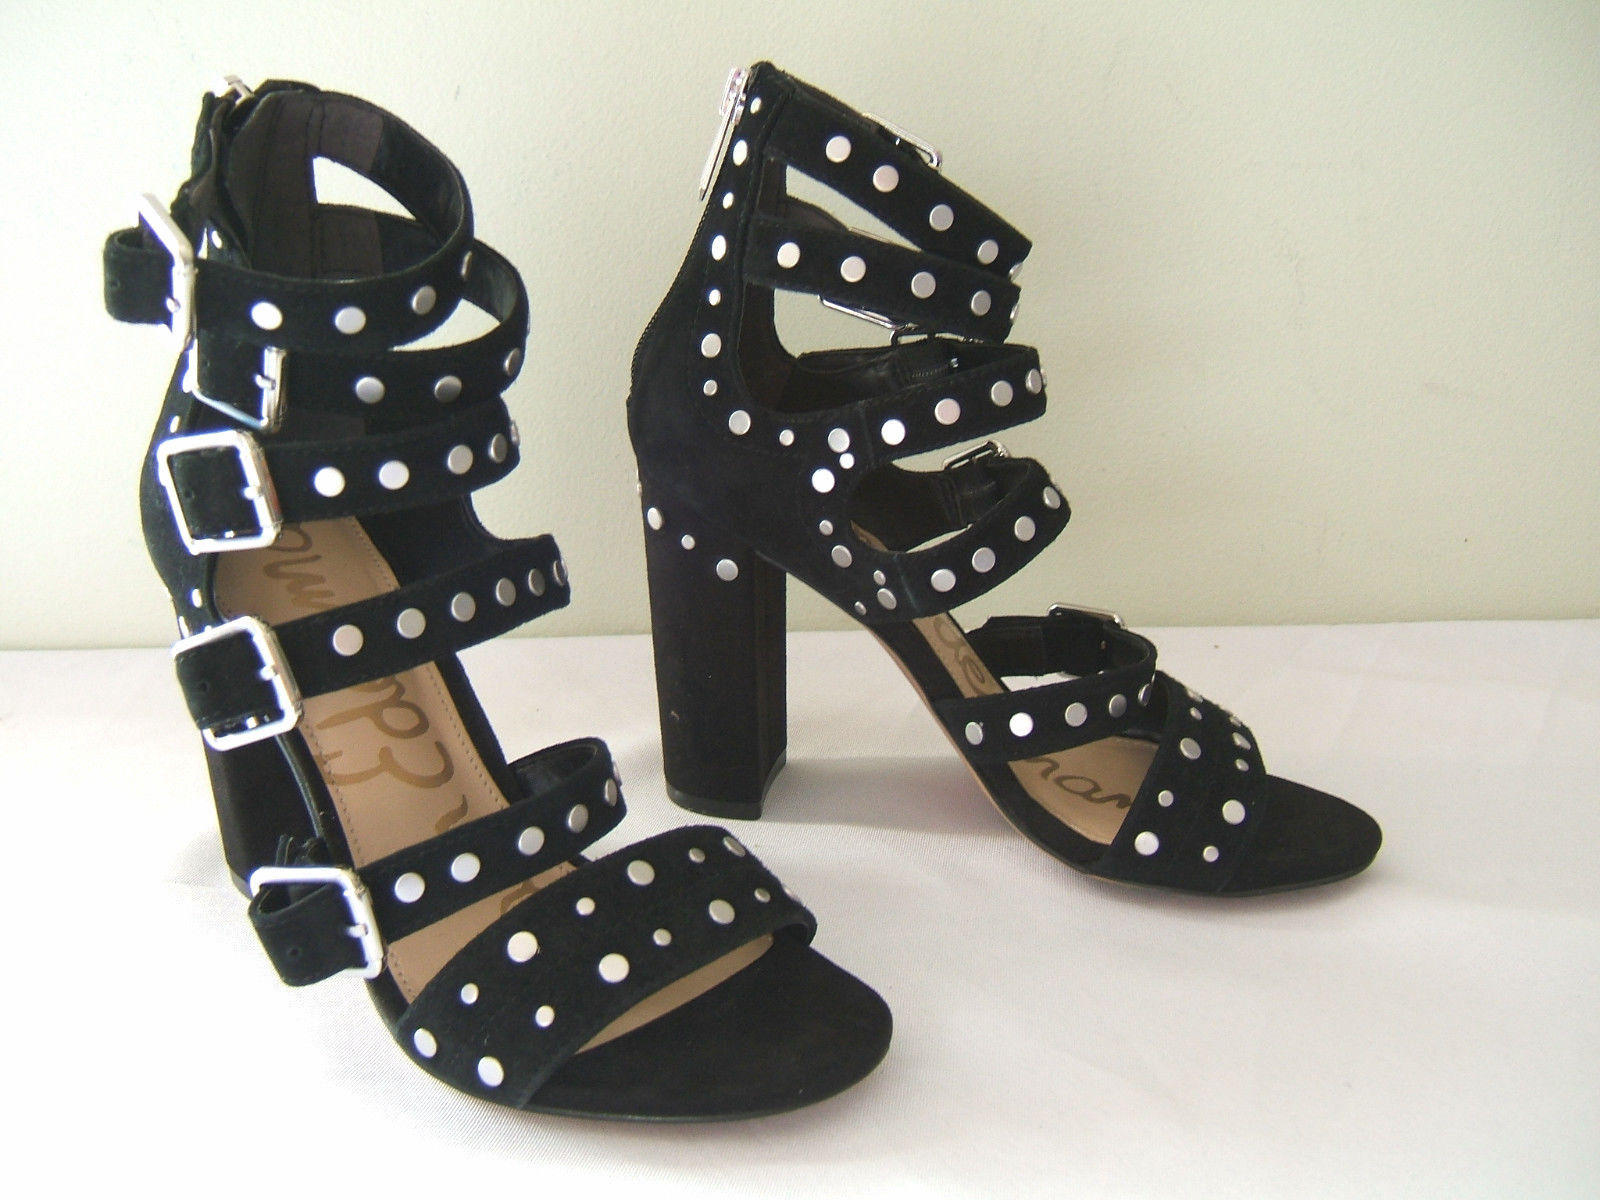 b9d4dc8548ef Sam Edelman Black Studded Suede Leather YORK Heels Sandals 6 M  175